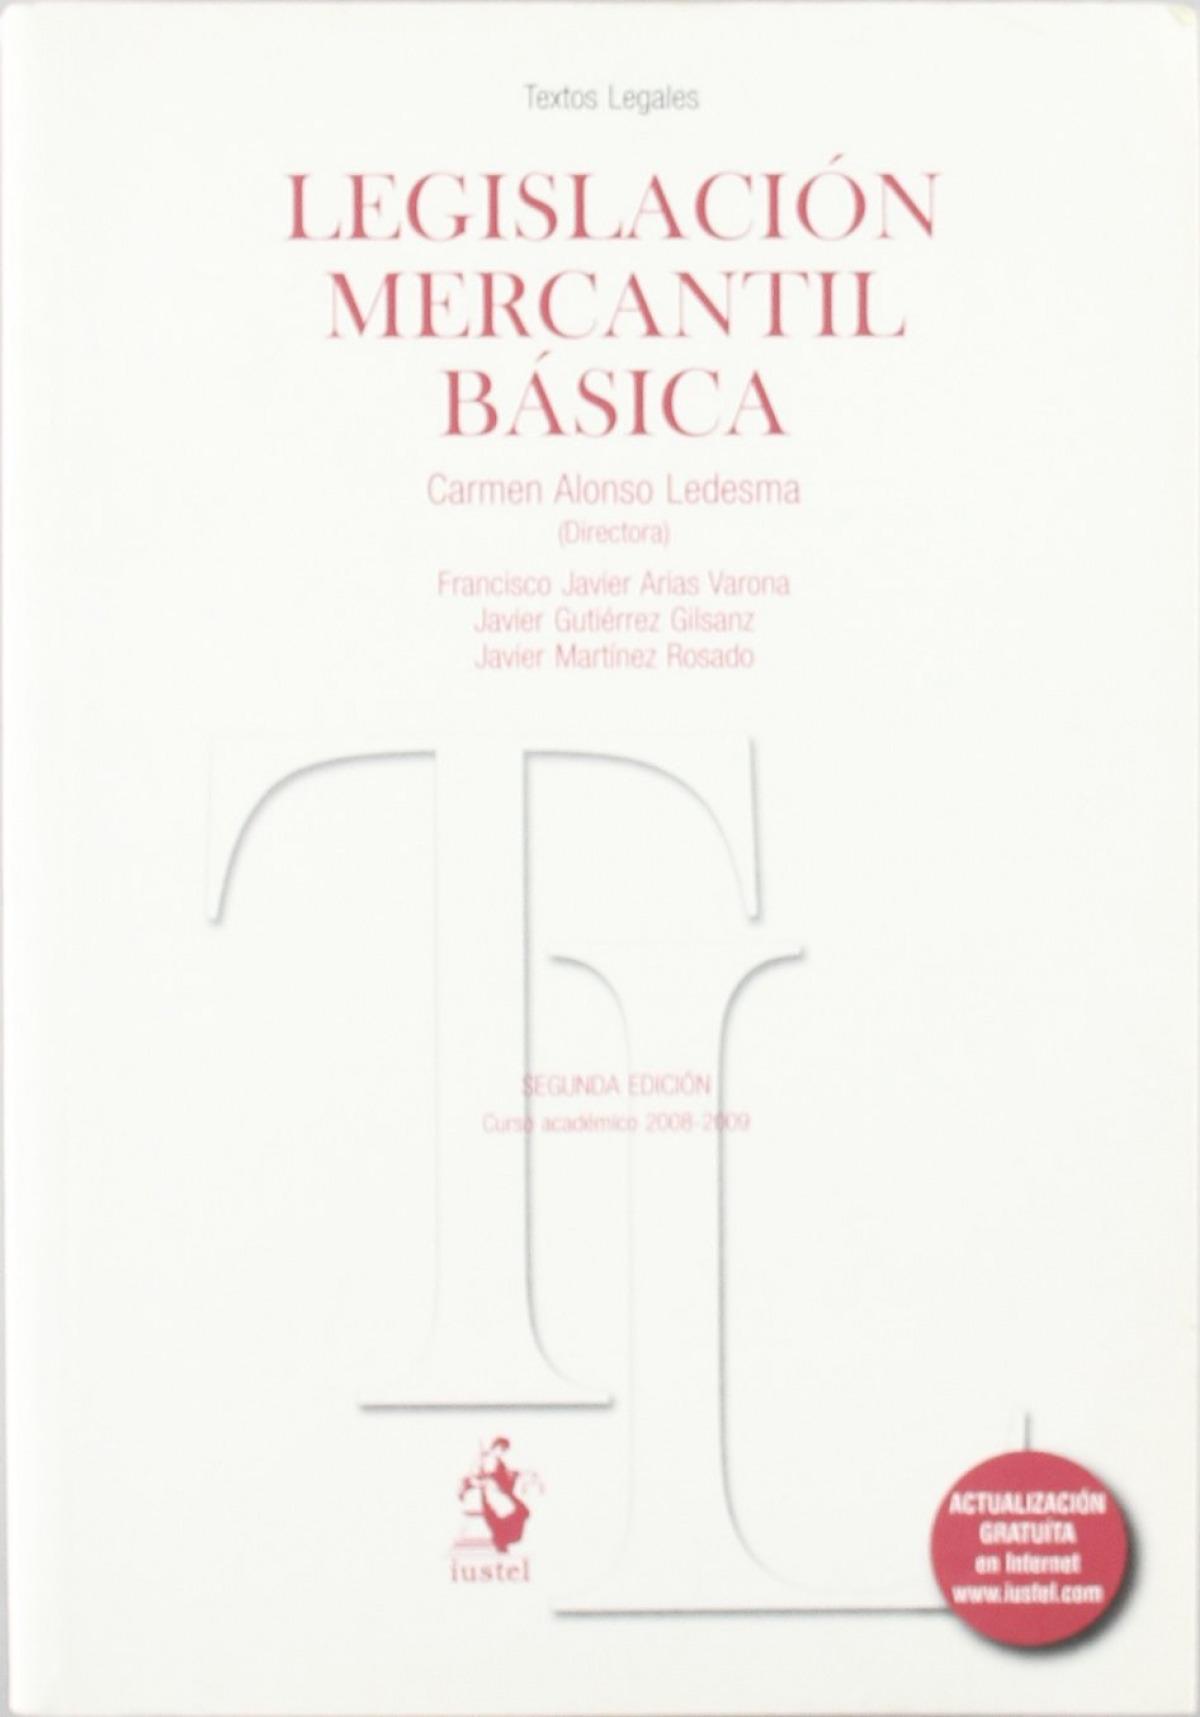 Legislacion mercantil basica - Alonso, Carmen